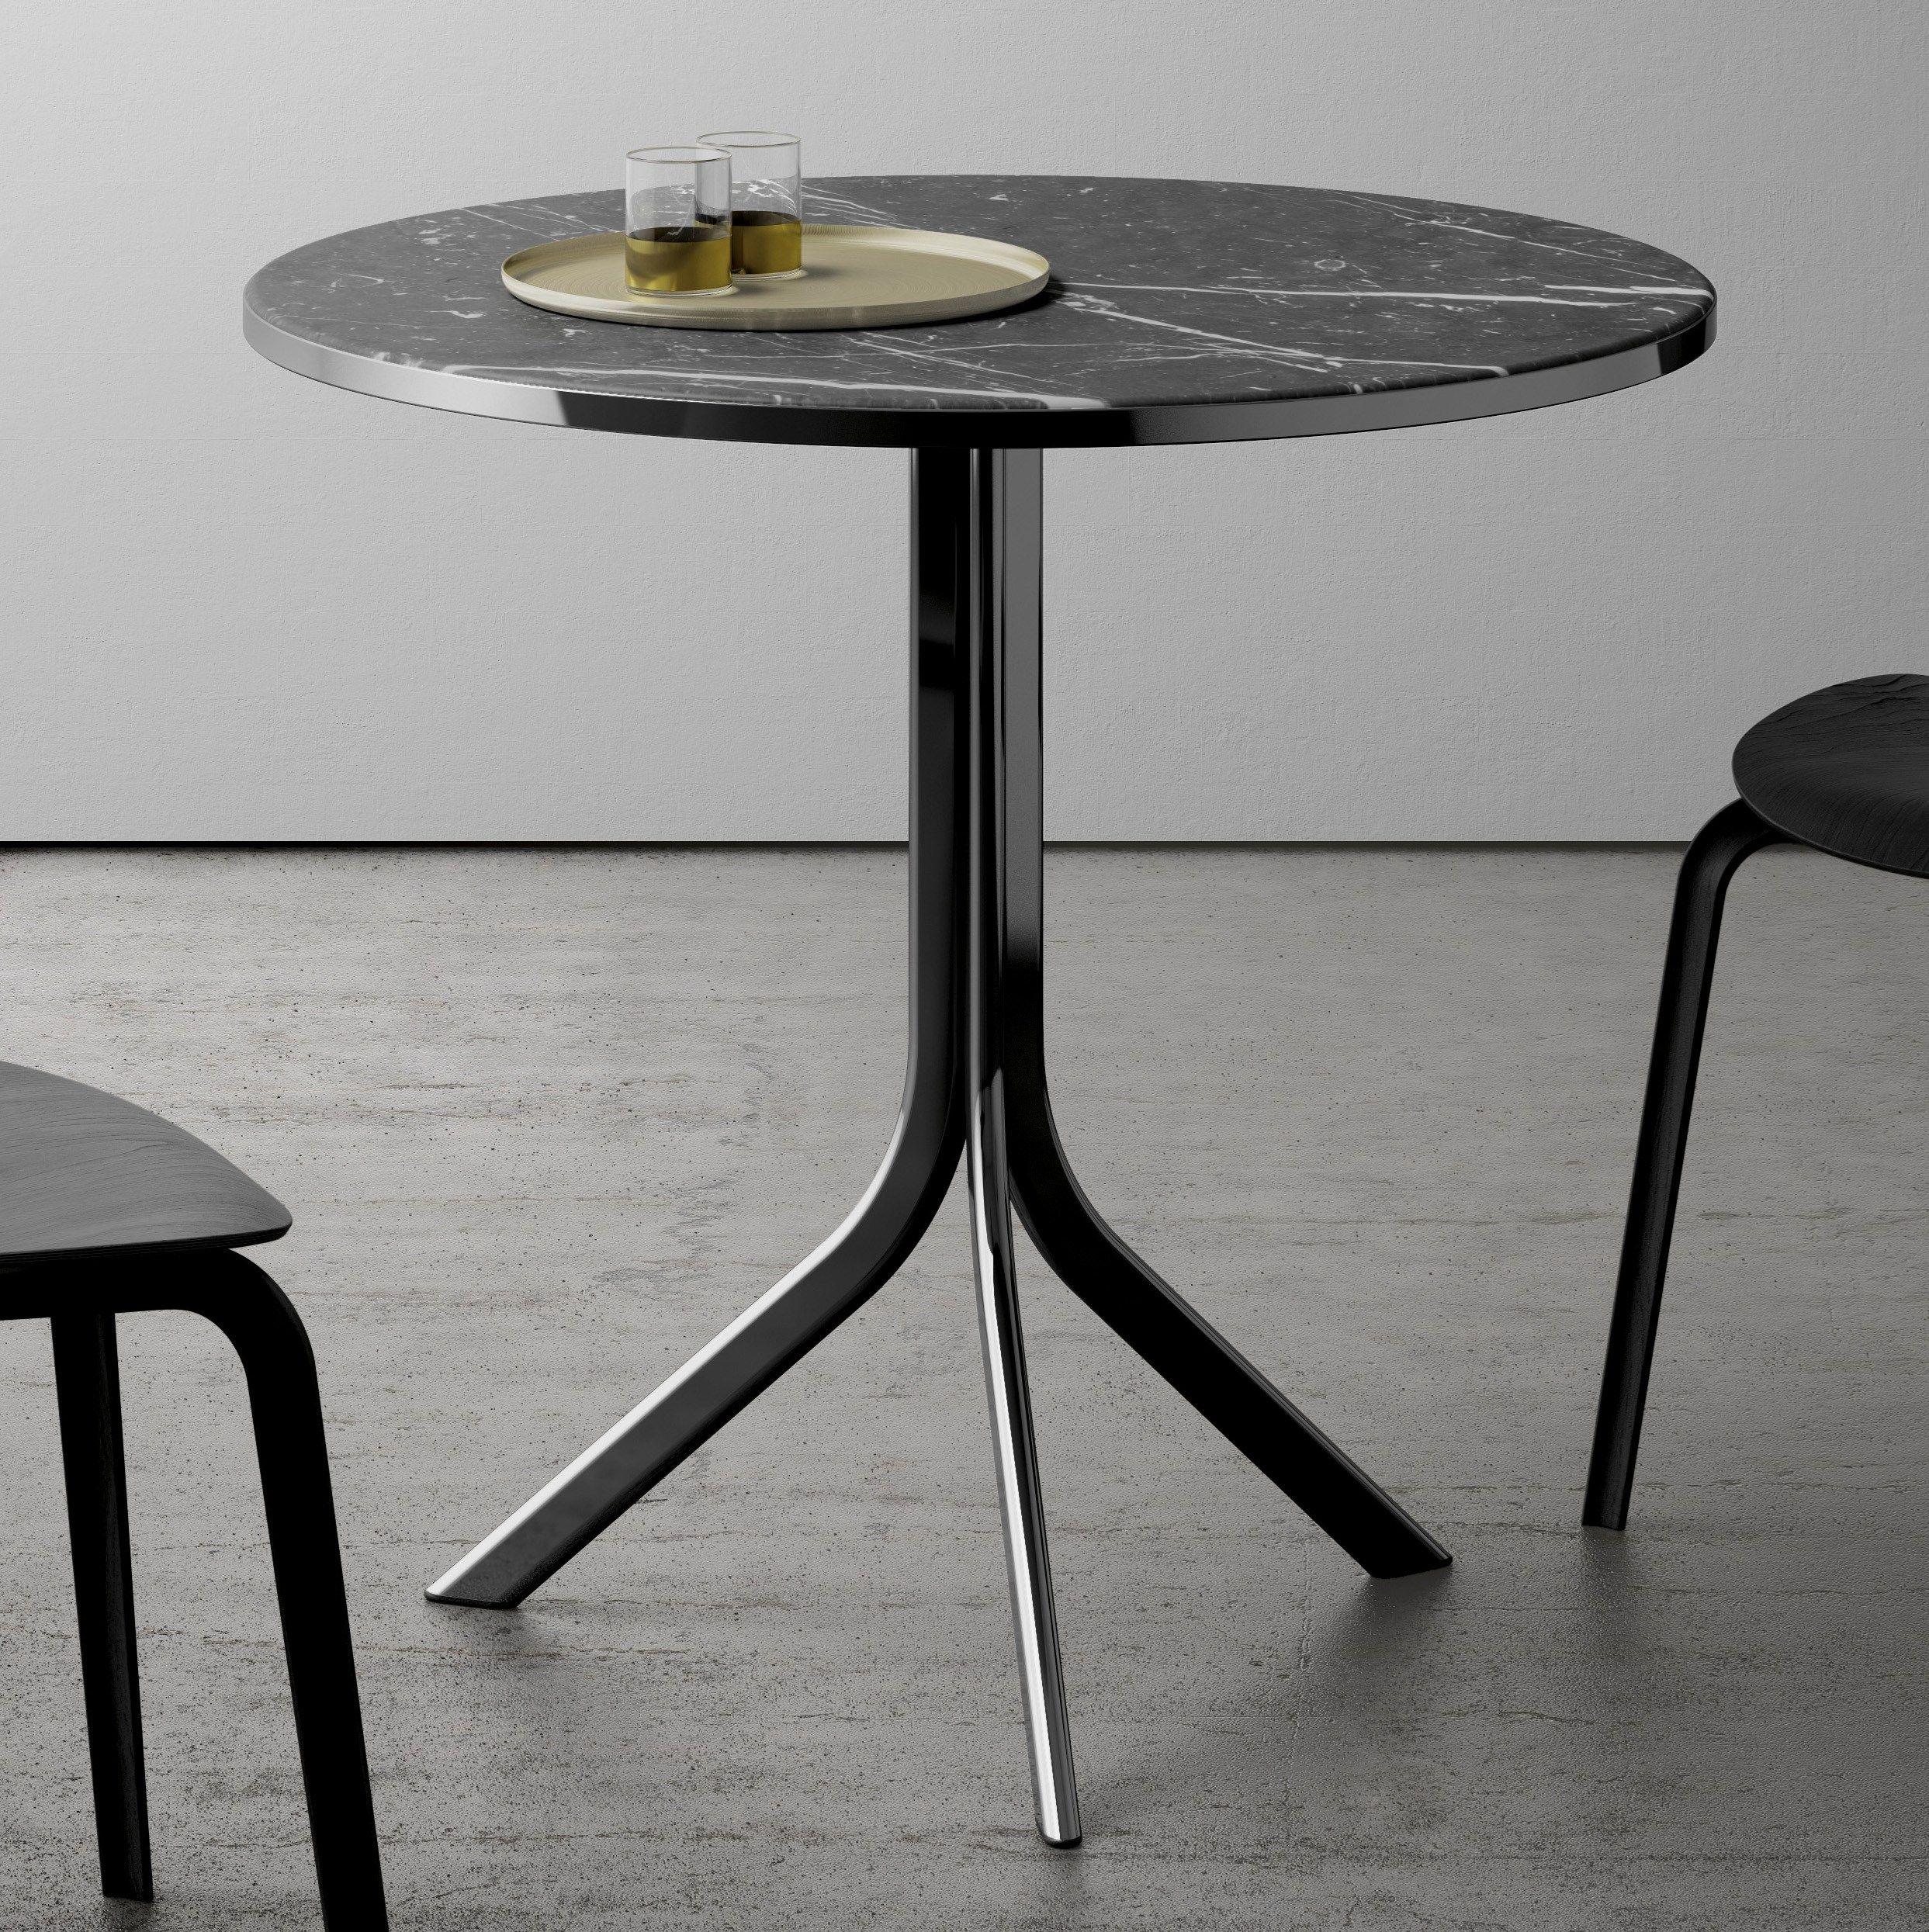 bistro tisch aus marmor by retegui design jean louis iratzoki. Black Bedroom Furniture Sets. Home Design Ideas